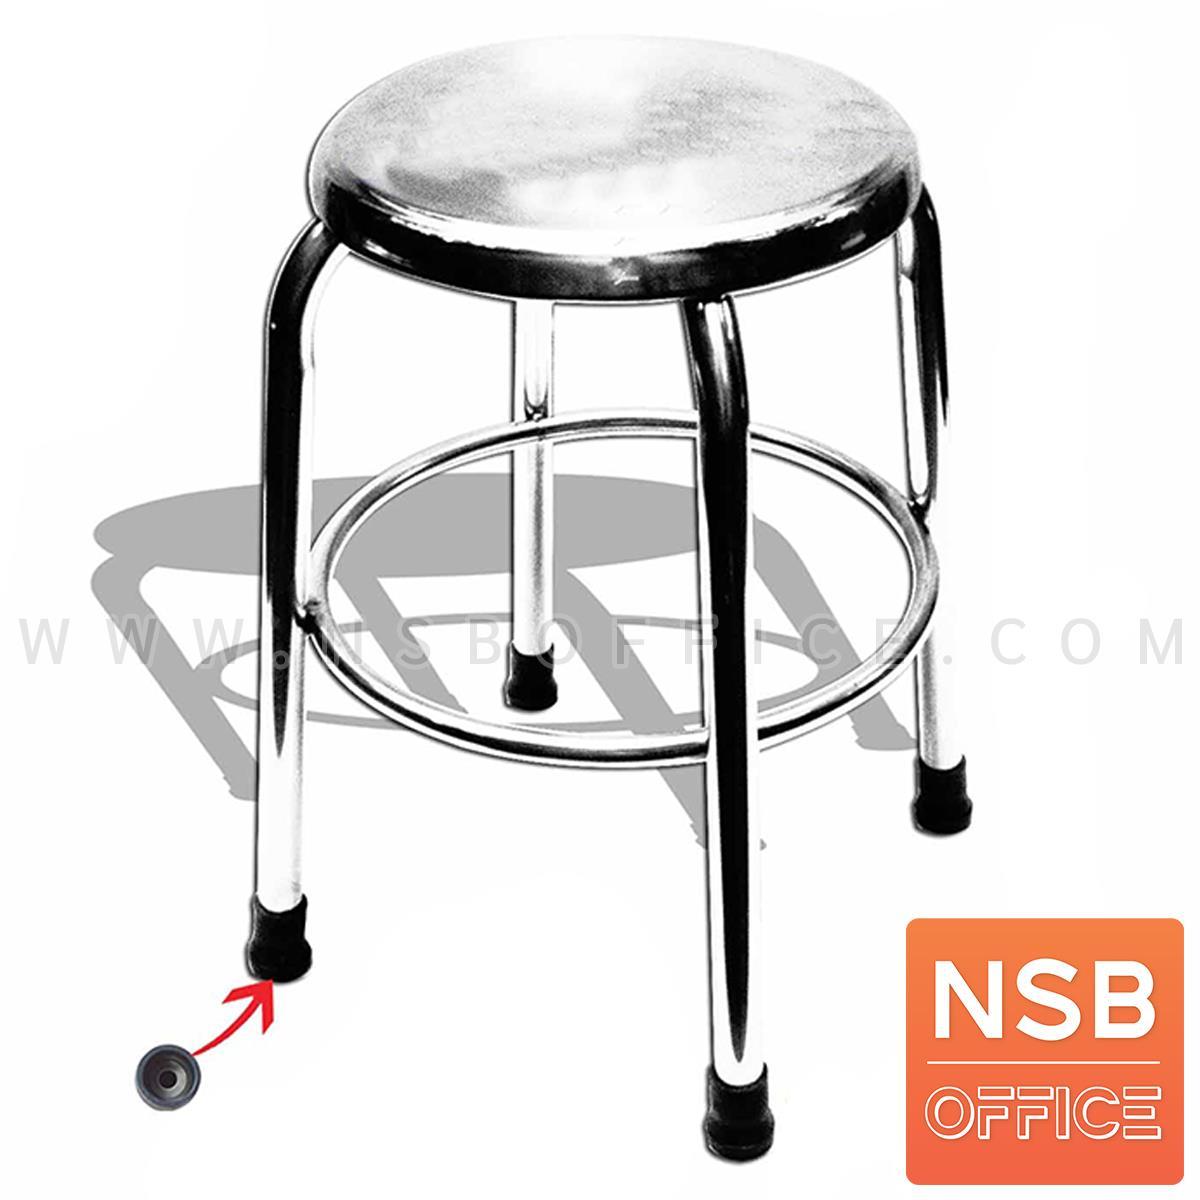 G12A285:เก้าอี้บาร์สตูลสเตนเลส รุ่น Roling (โรลลิ่ง) ขนาด 32Di*50H cm.